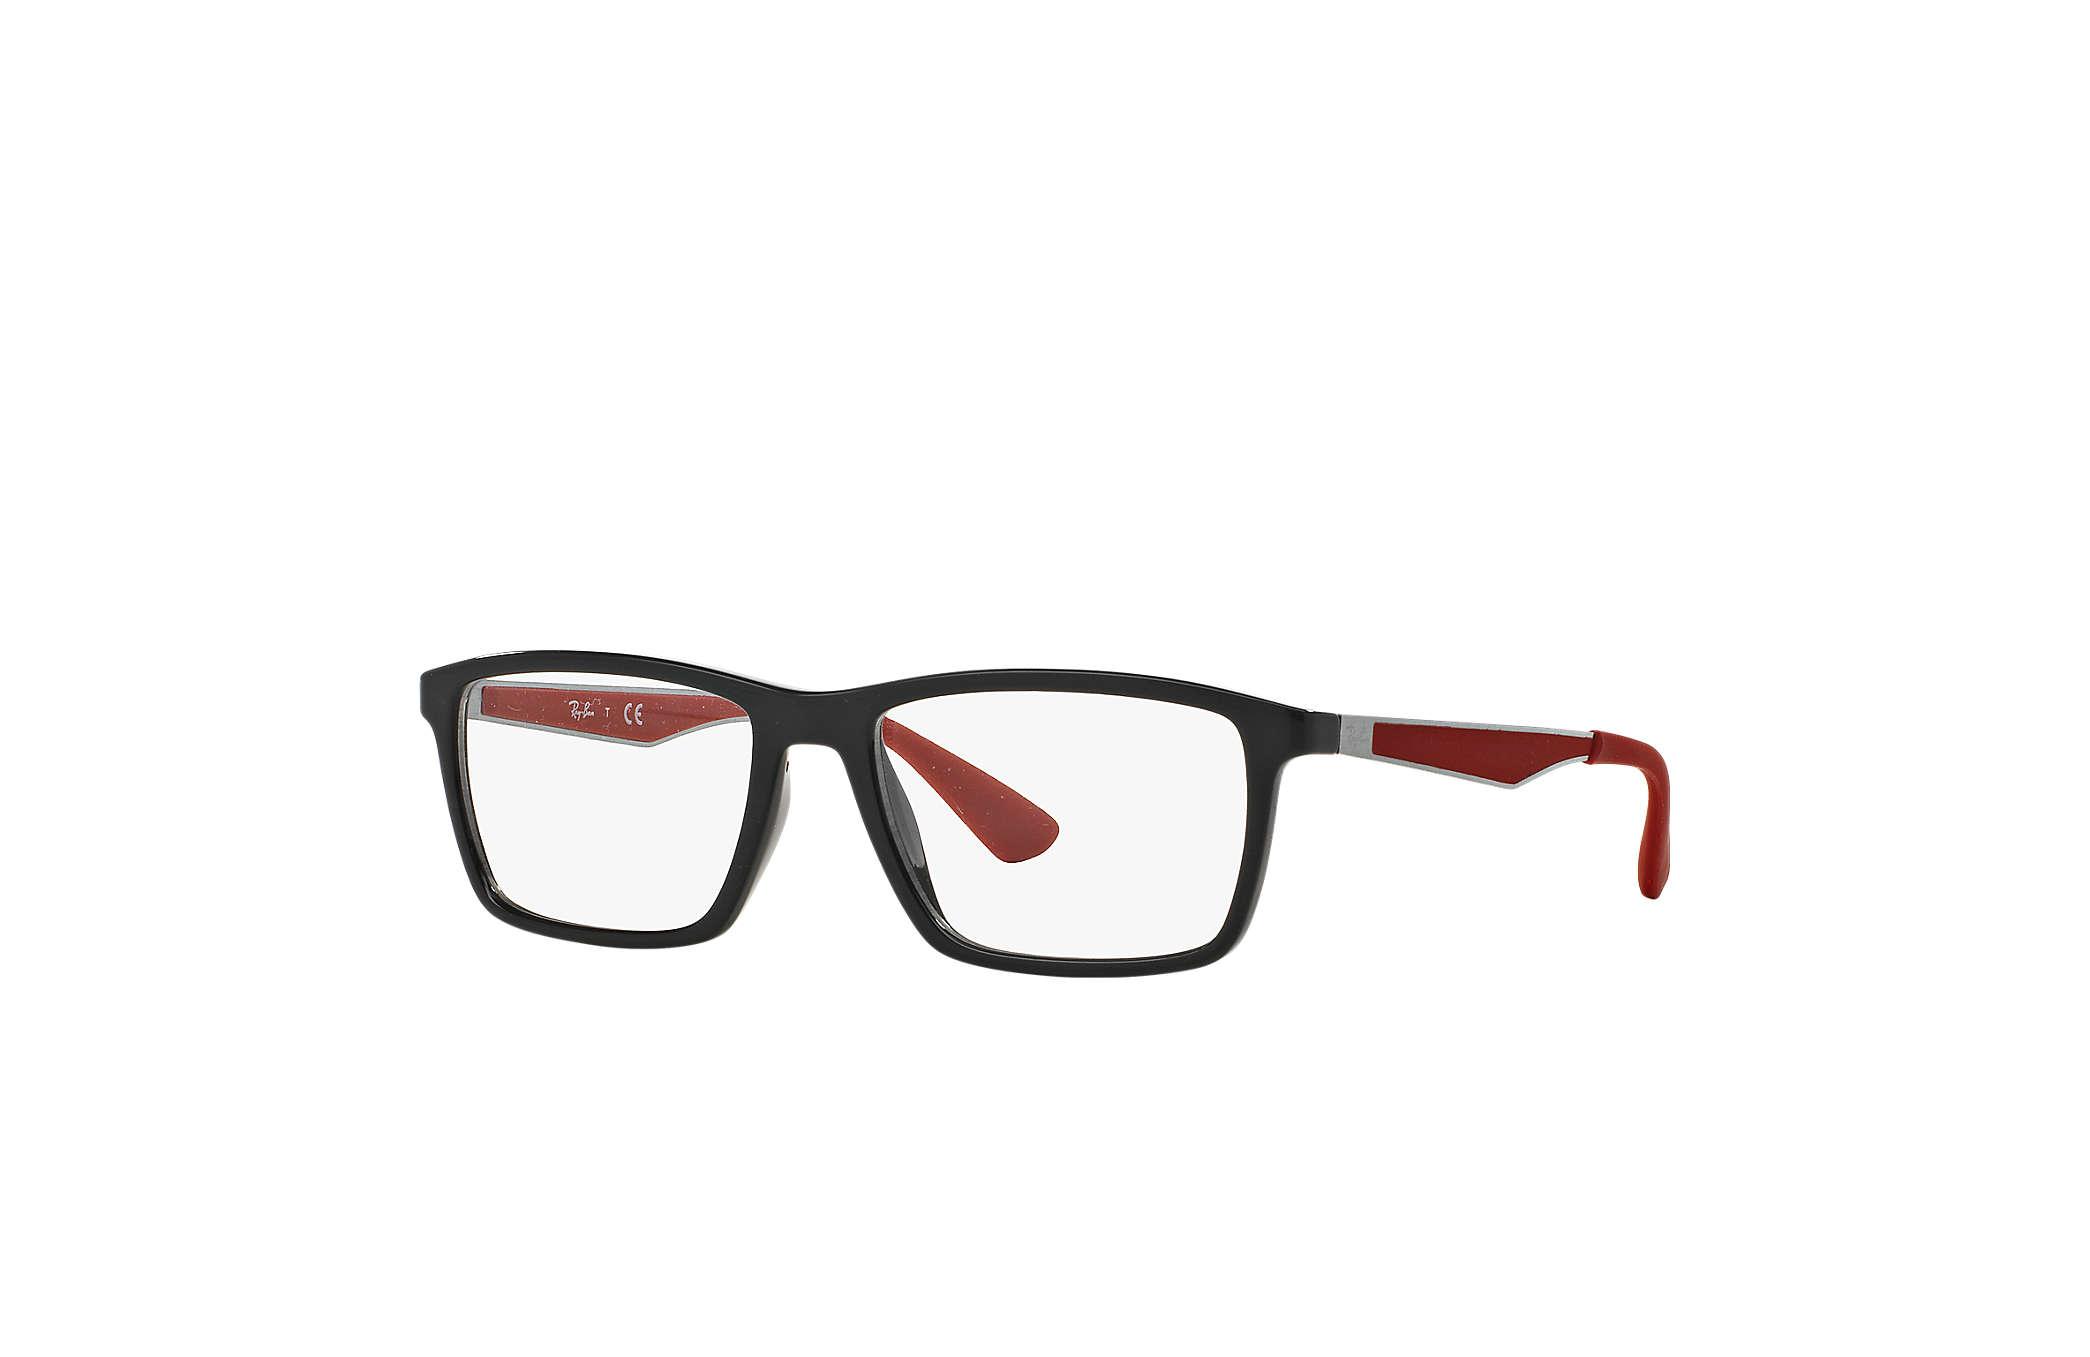 0dd15f504d Ray-Ban prescription glasses RB7056 Grey - Nylon - 0RX7056541855 ...